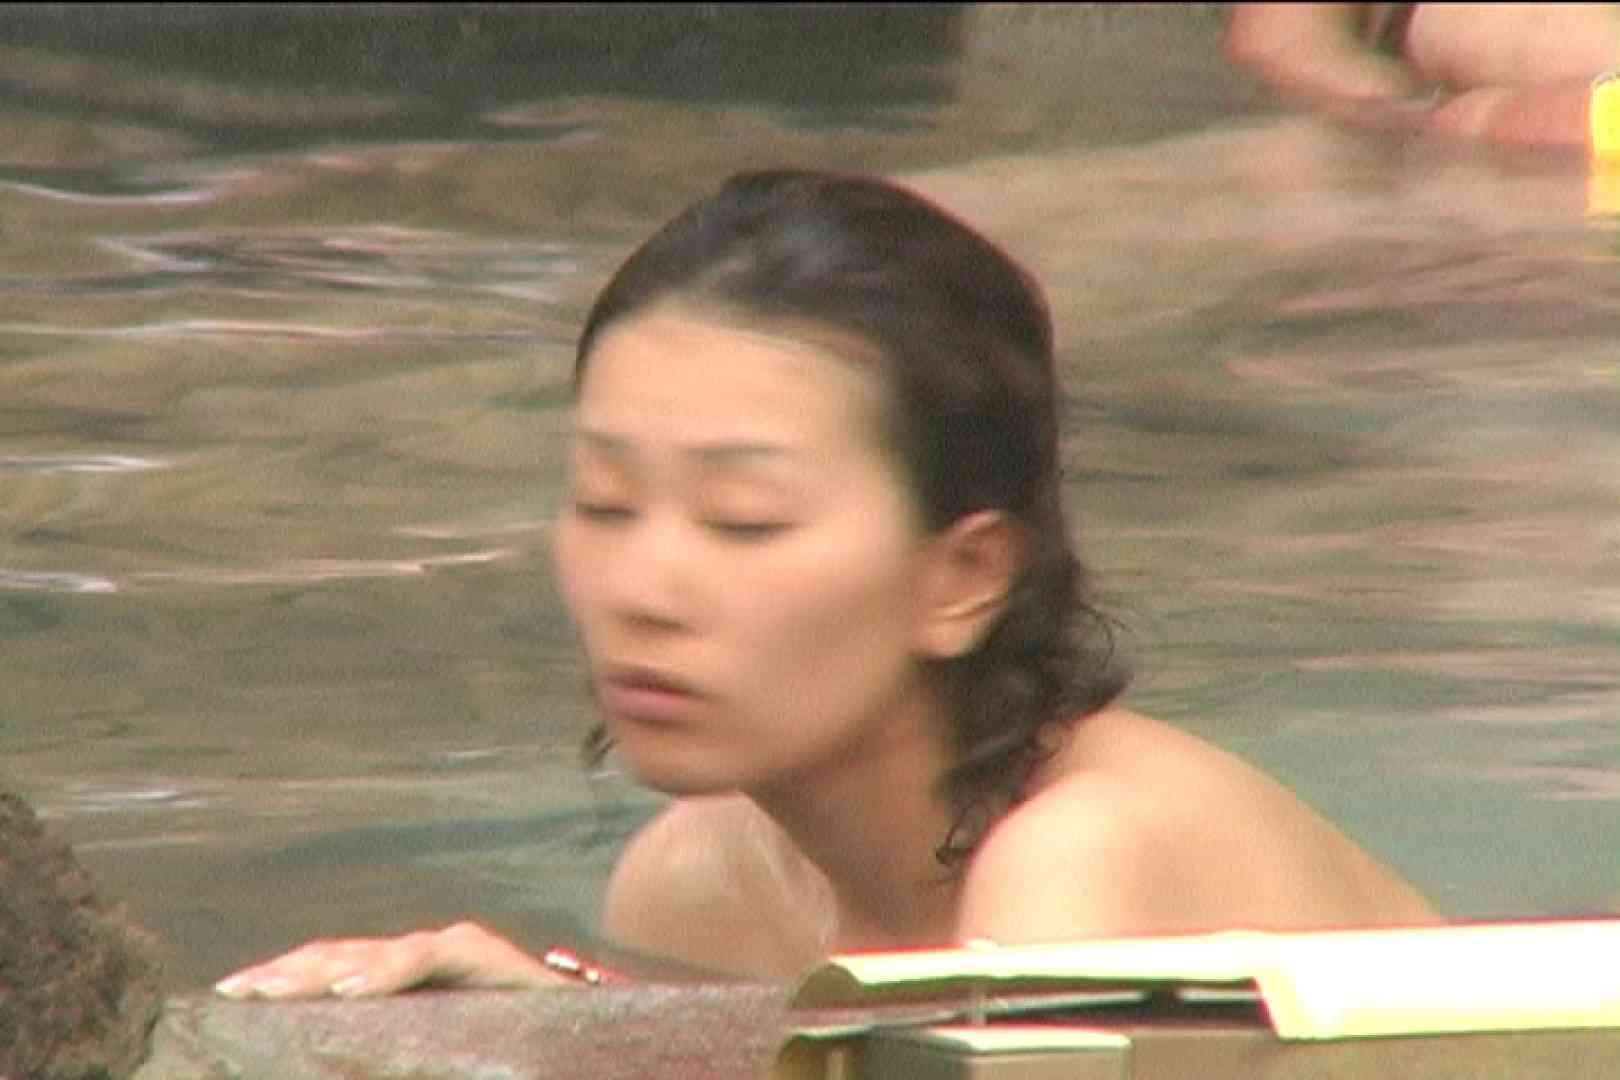 Aquaな露天風呂Vol.131 女体盗撮 覗きスケベ動画紹介 82連発 38